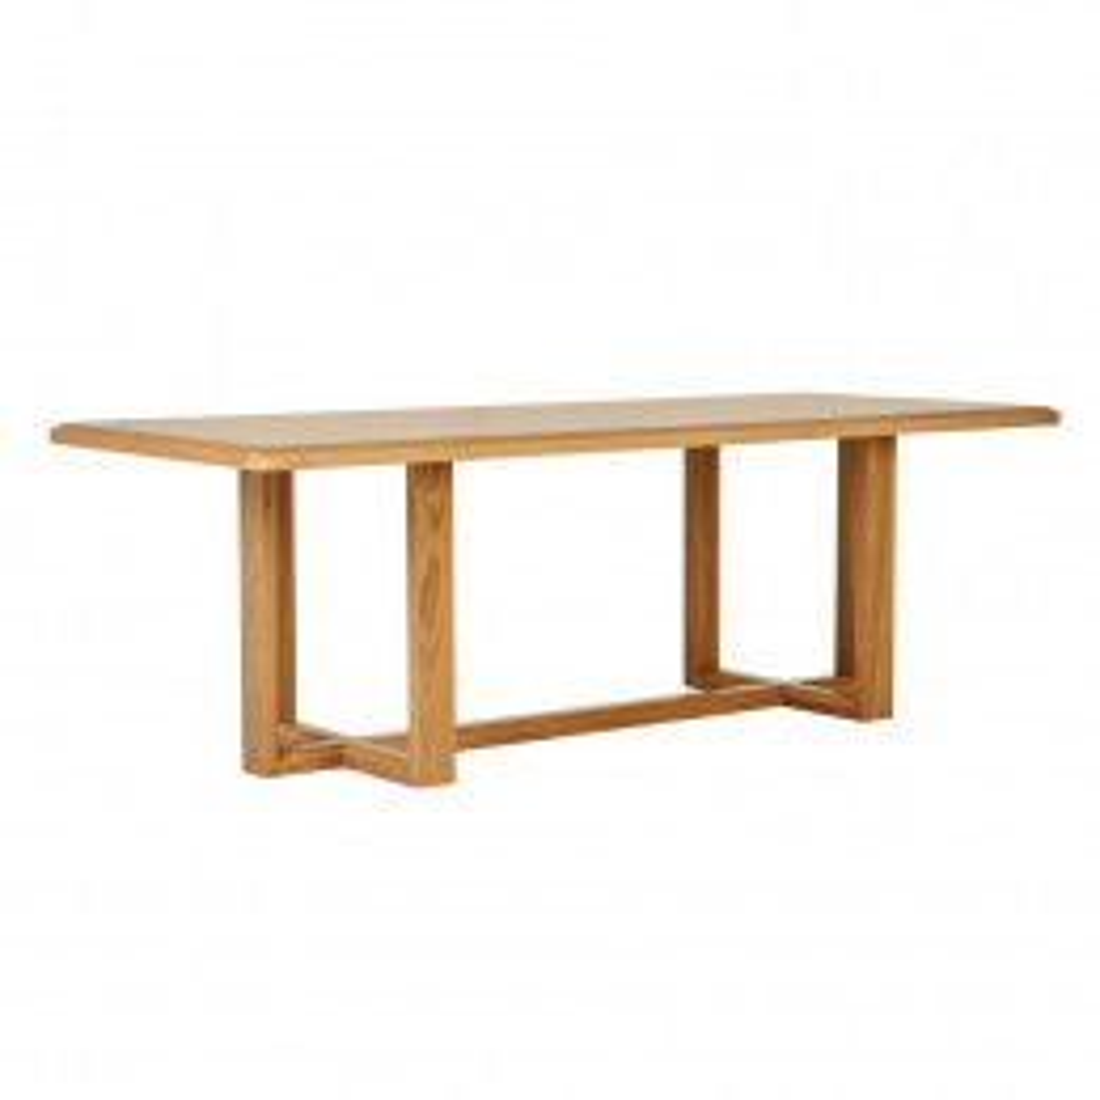 Lloyd Cross Dining Table